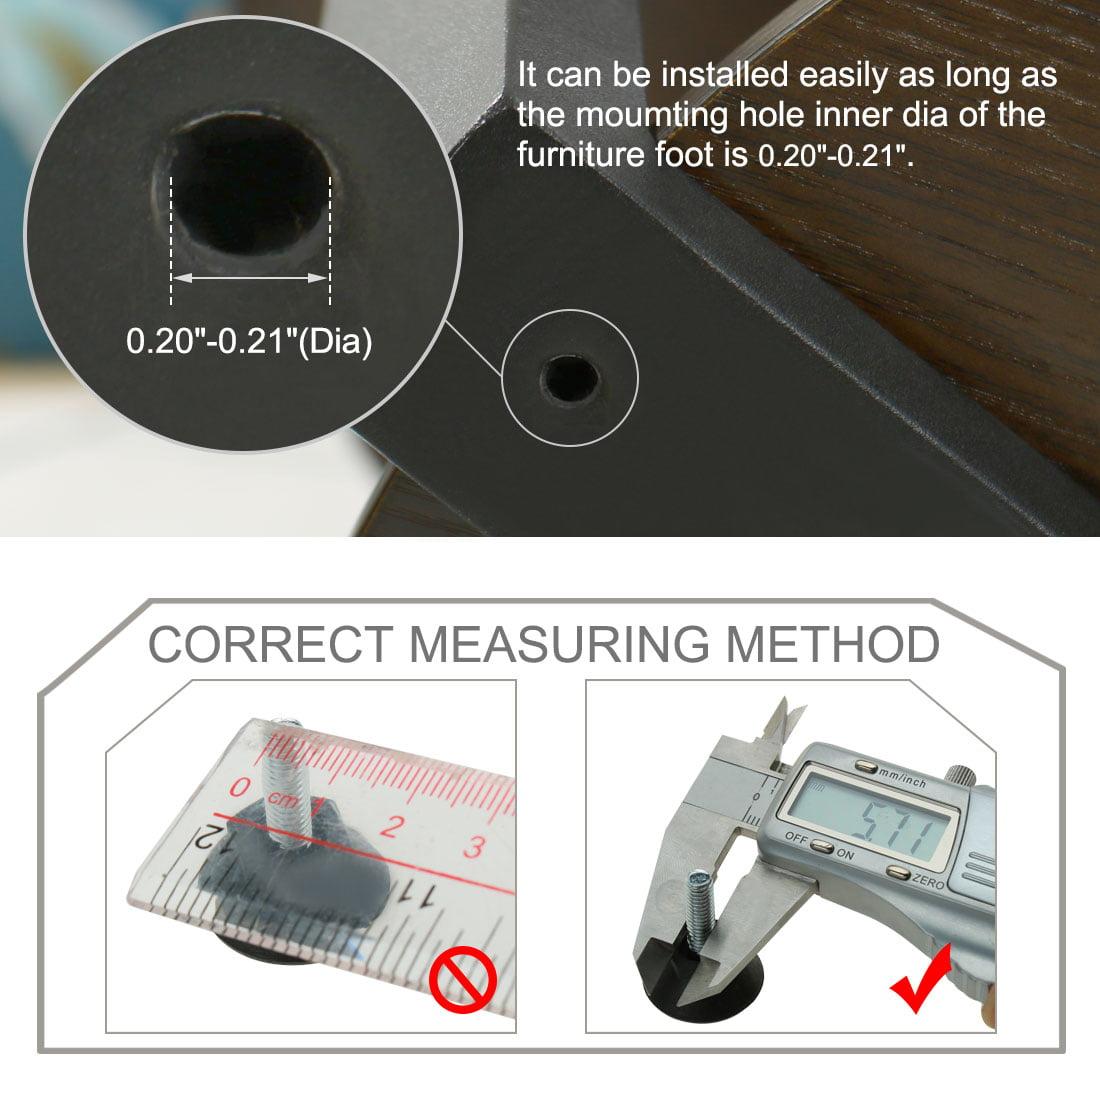 M6 x 20 x 25mm Adjustable Leveling Feet Floor Protector for Table Leg 24pcs - image 1 de 7